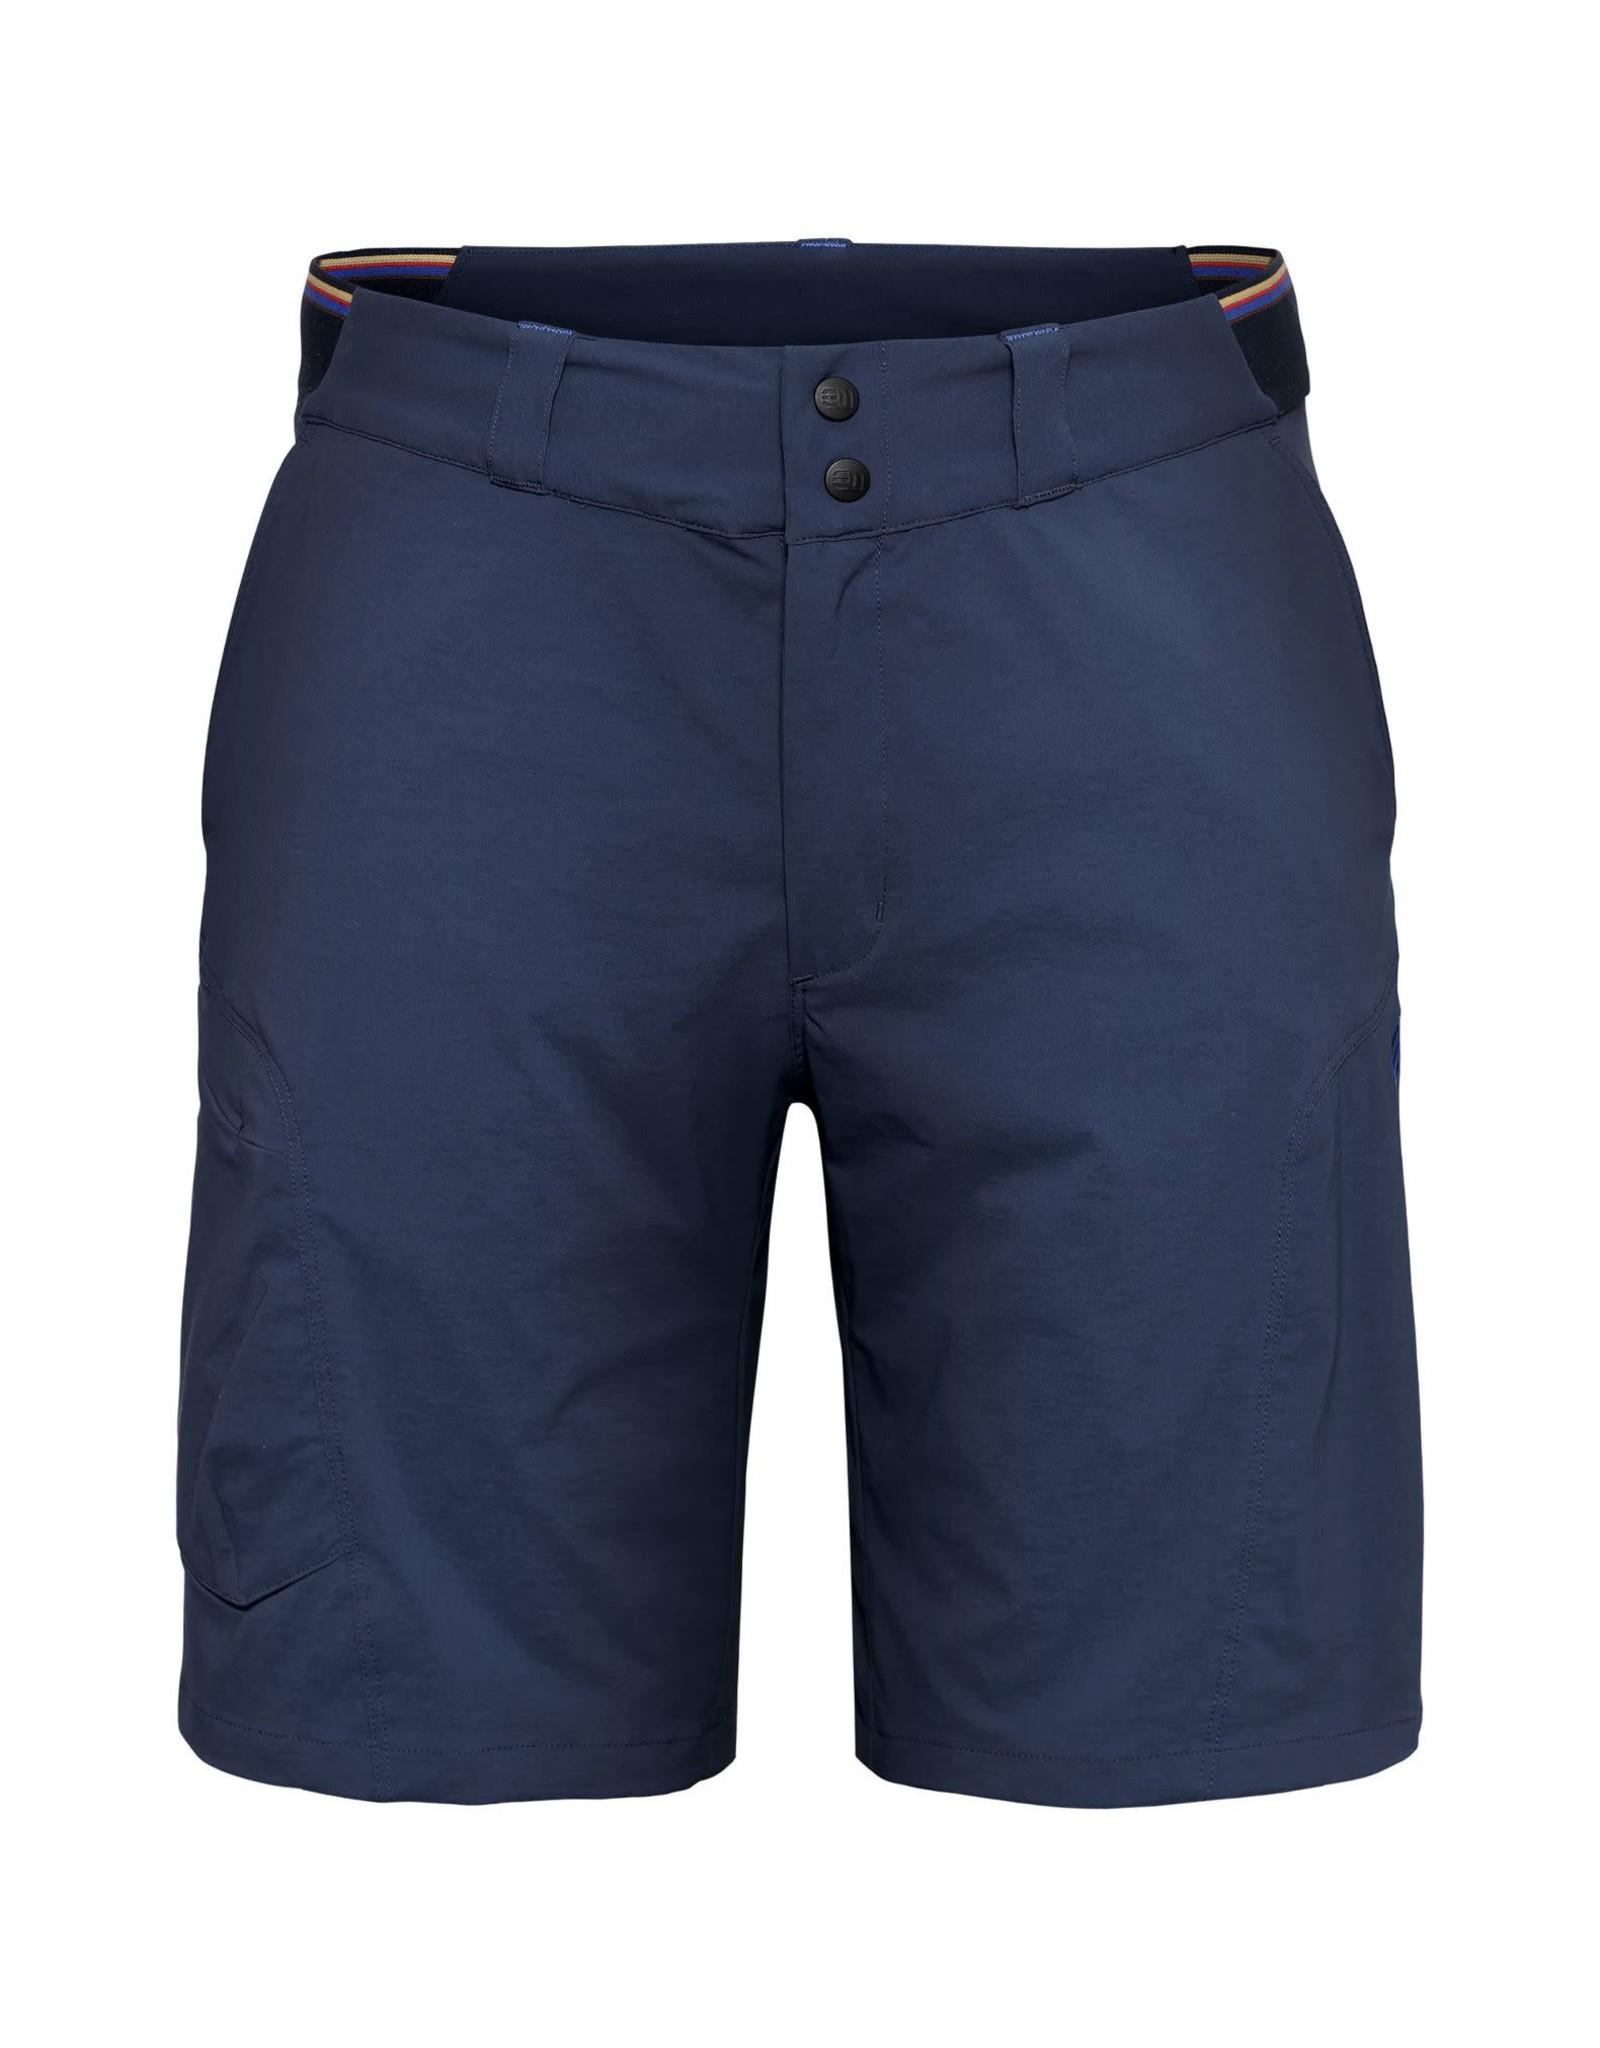 Elevenate Randonnee Shorts